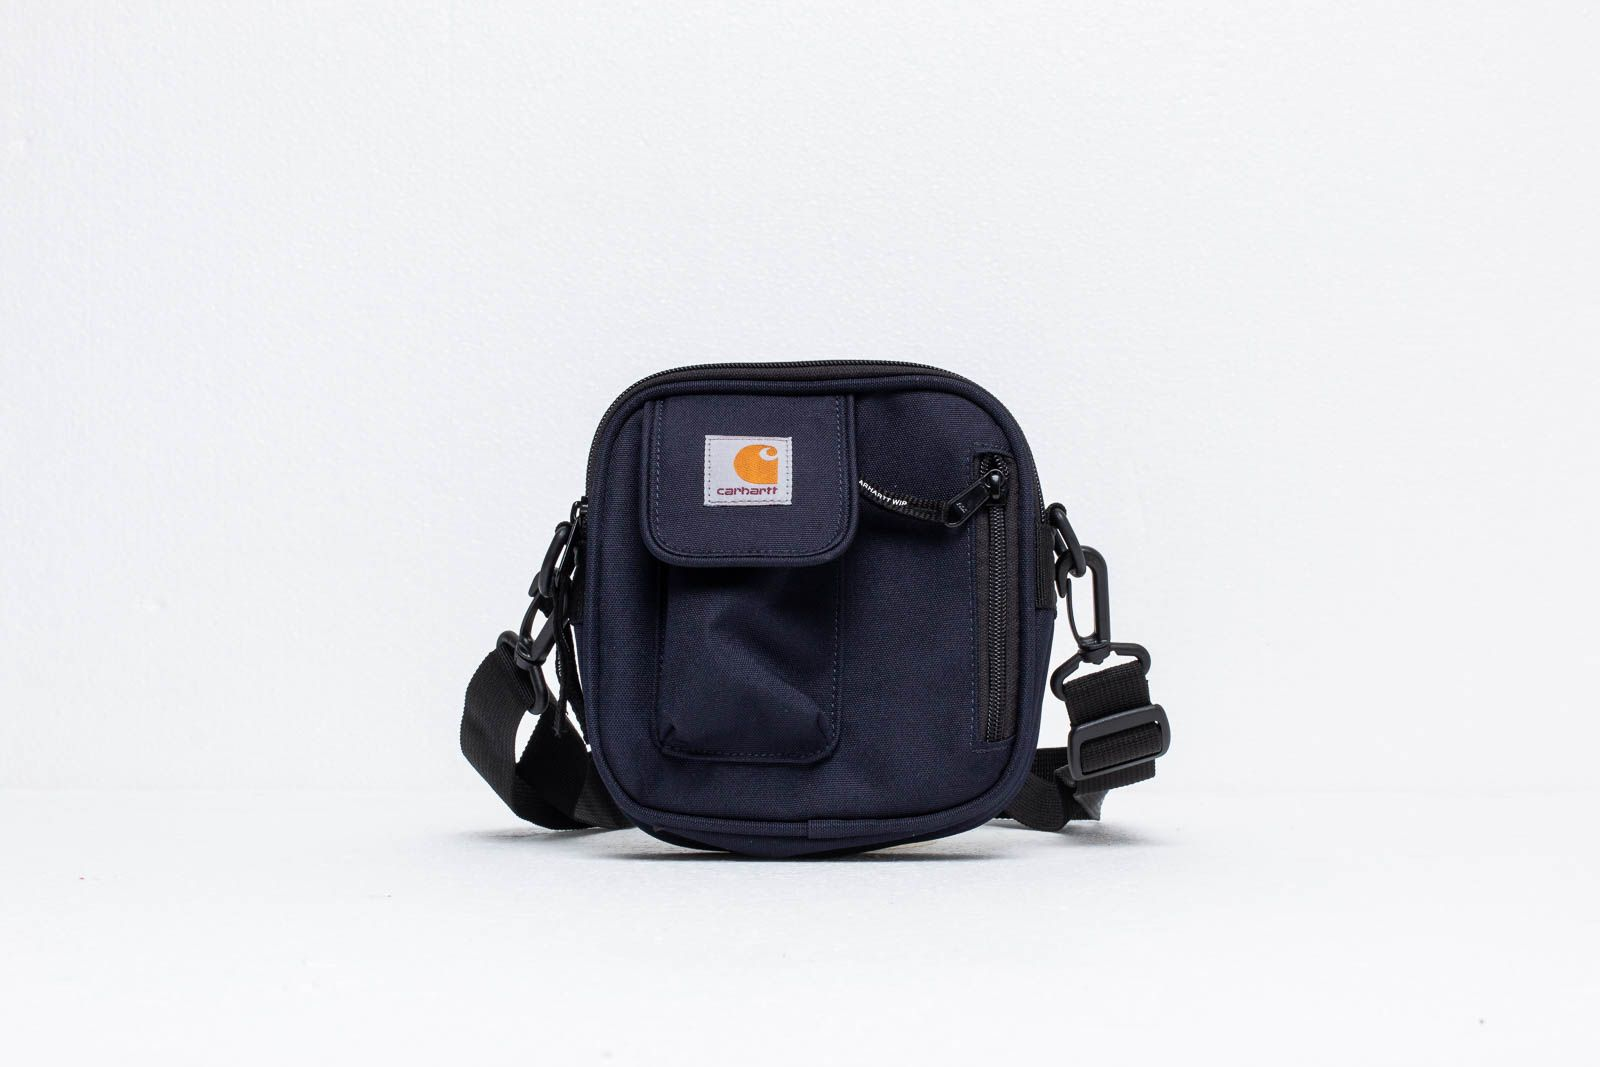 Torbe Carhartt WIP Essentials Small Bag Dark Navy